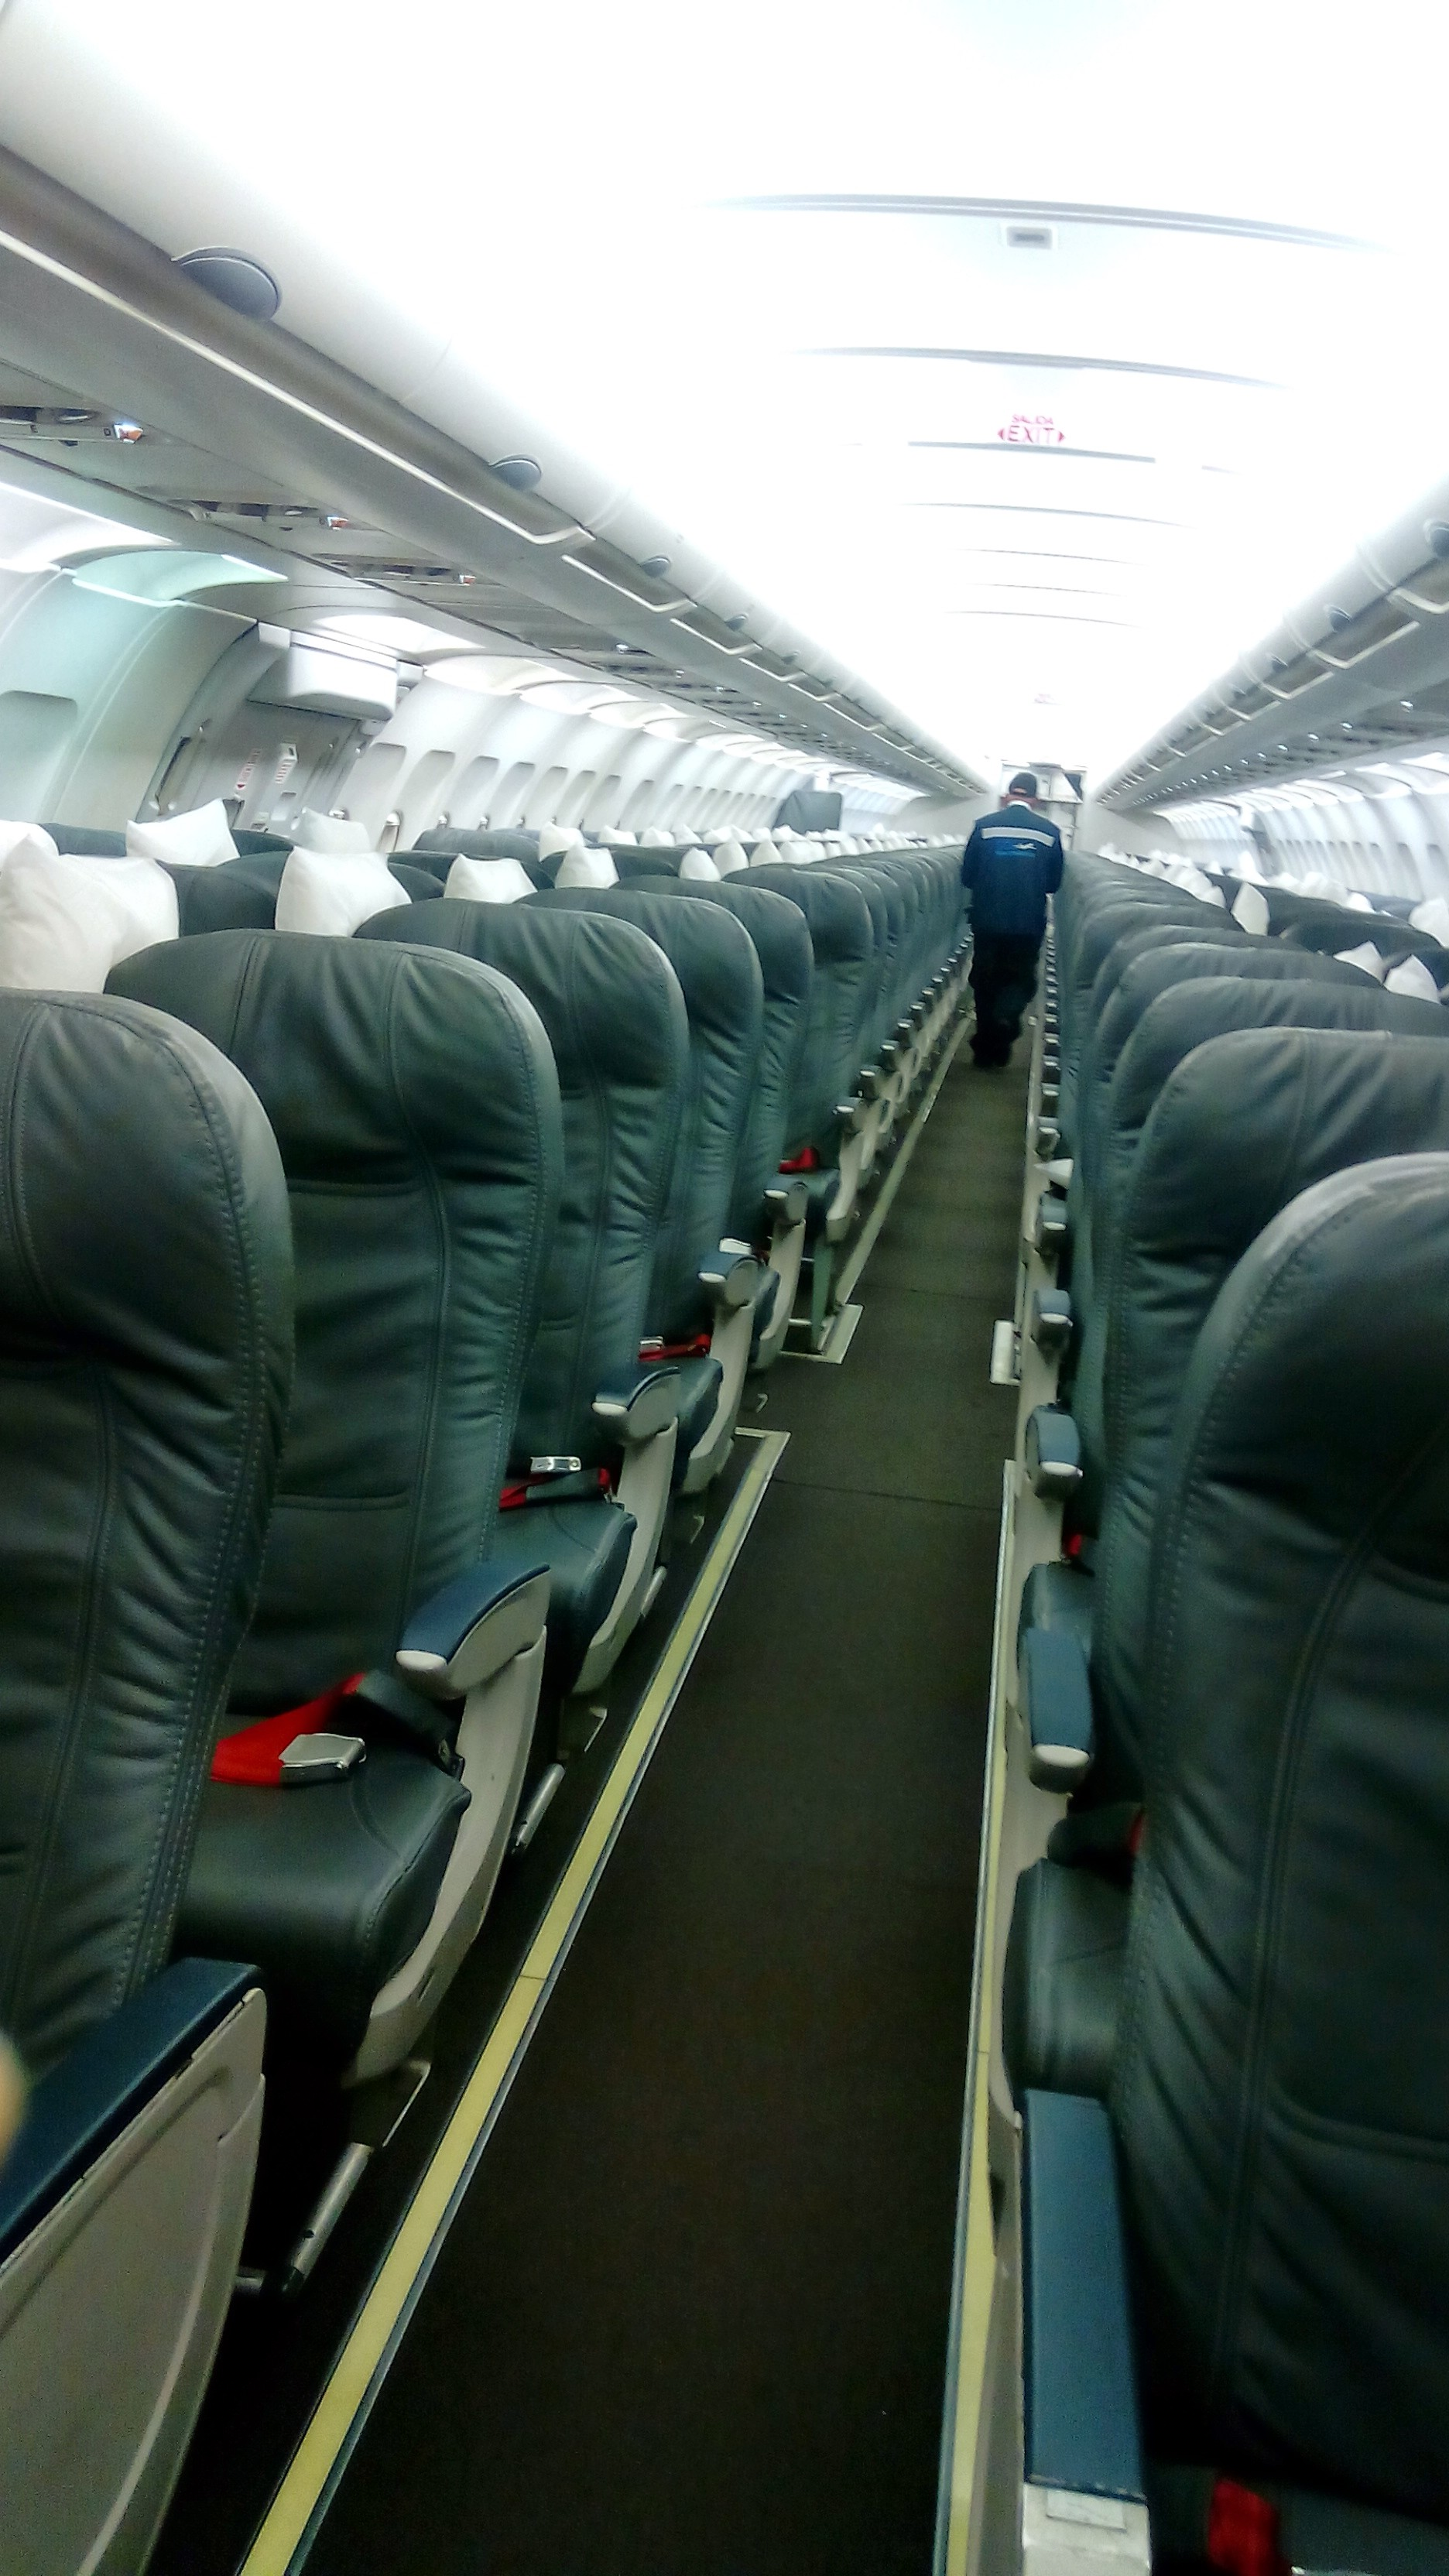 File:Interior de Airbus A320.jpg - Wikimedia Commons